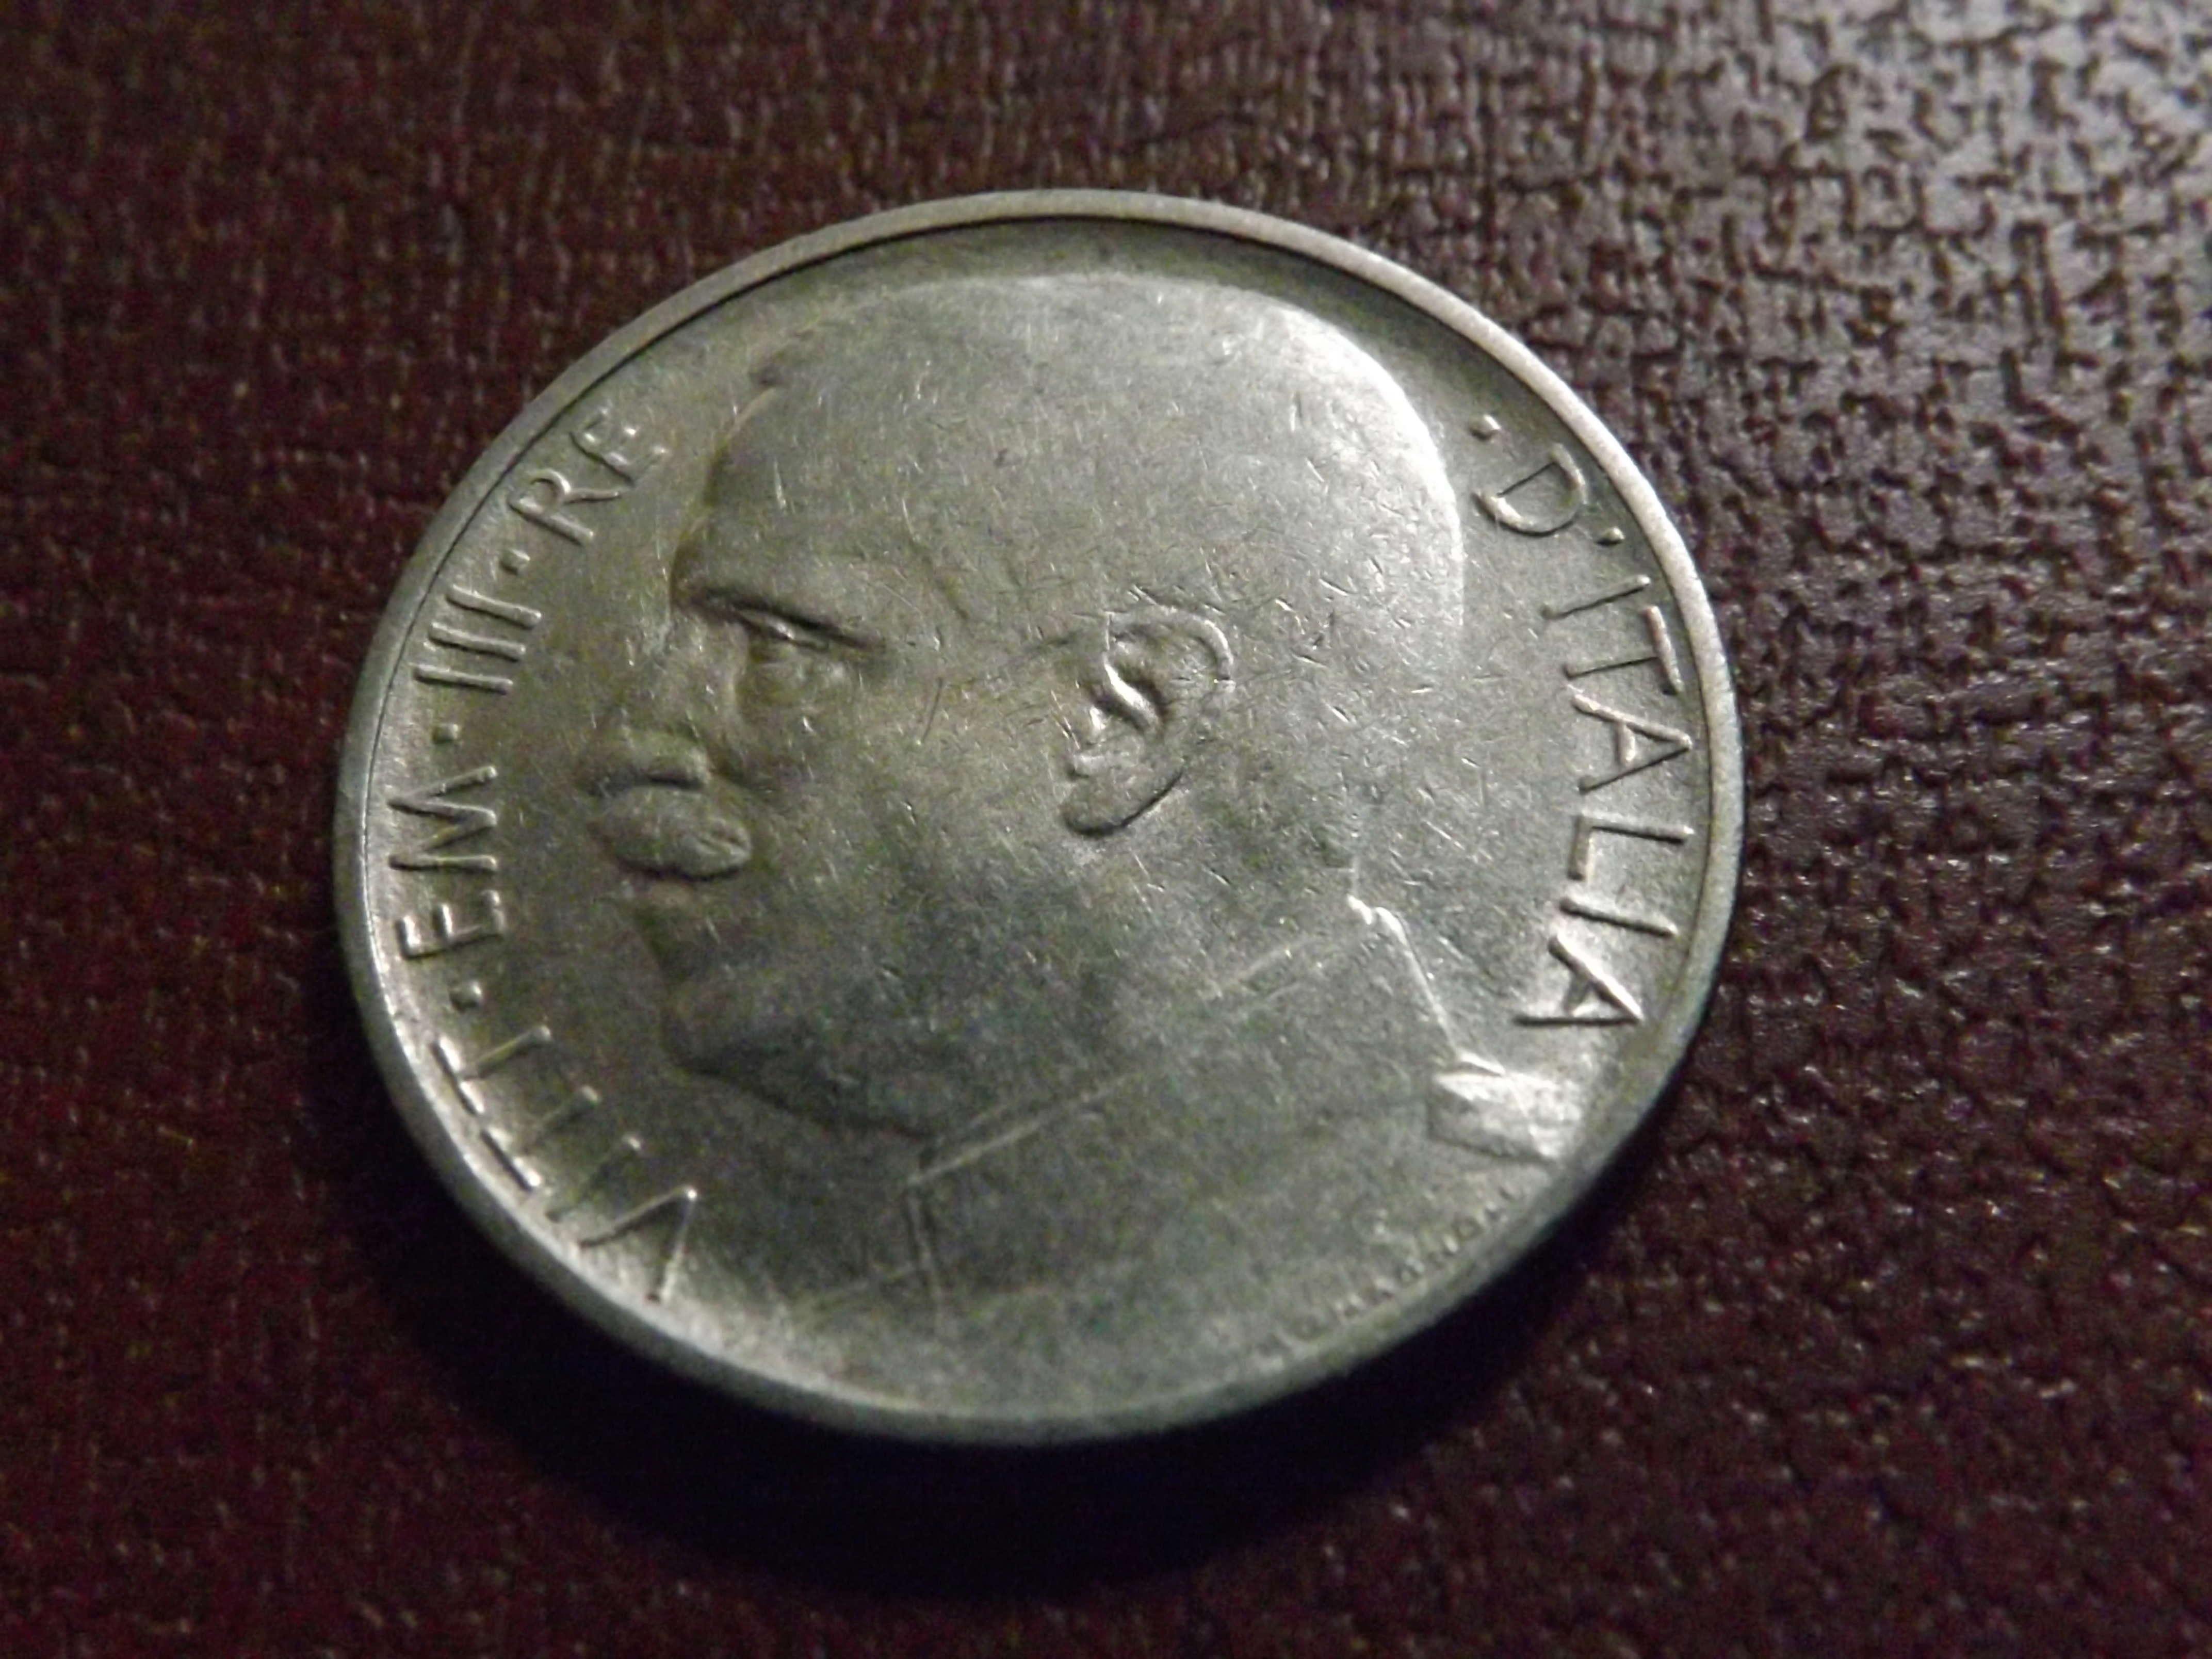 50 Céntimos de Lira de 1.920 (canto modificado) . Italia Dscf3126